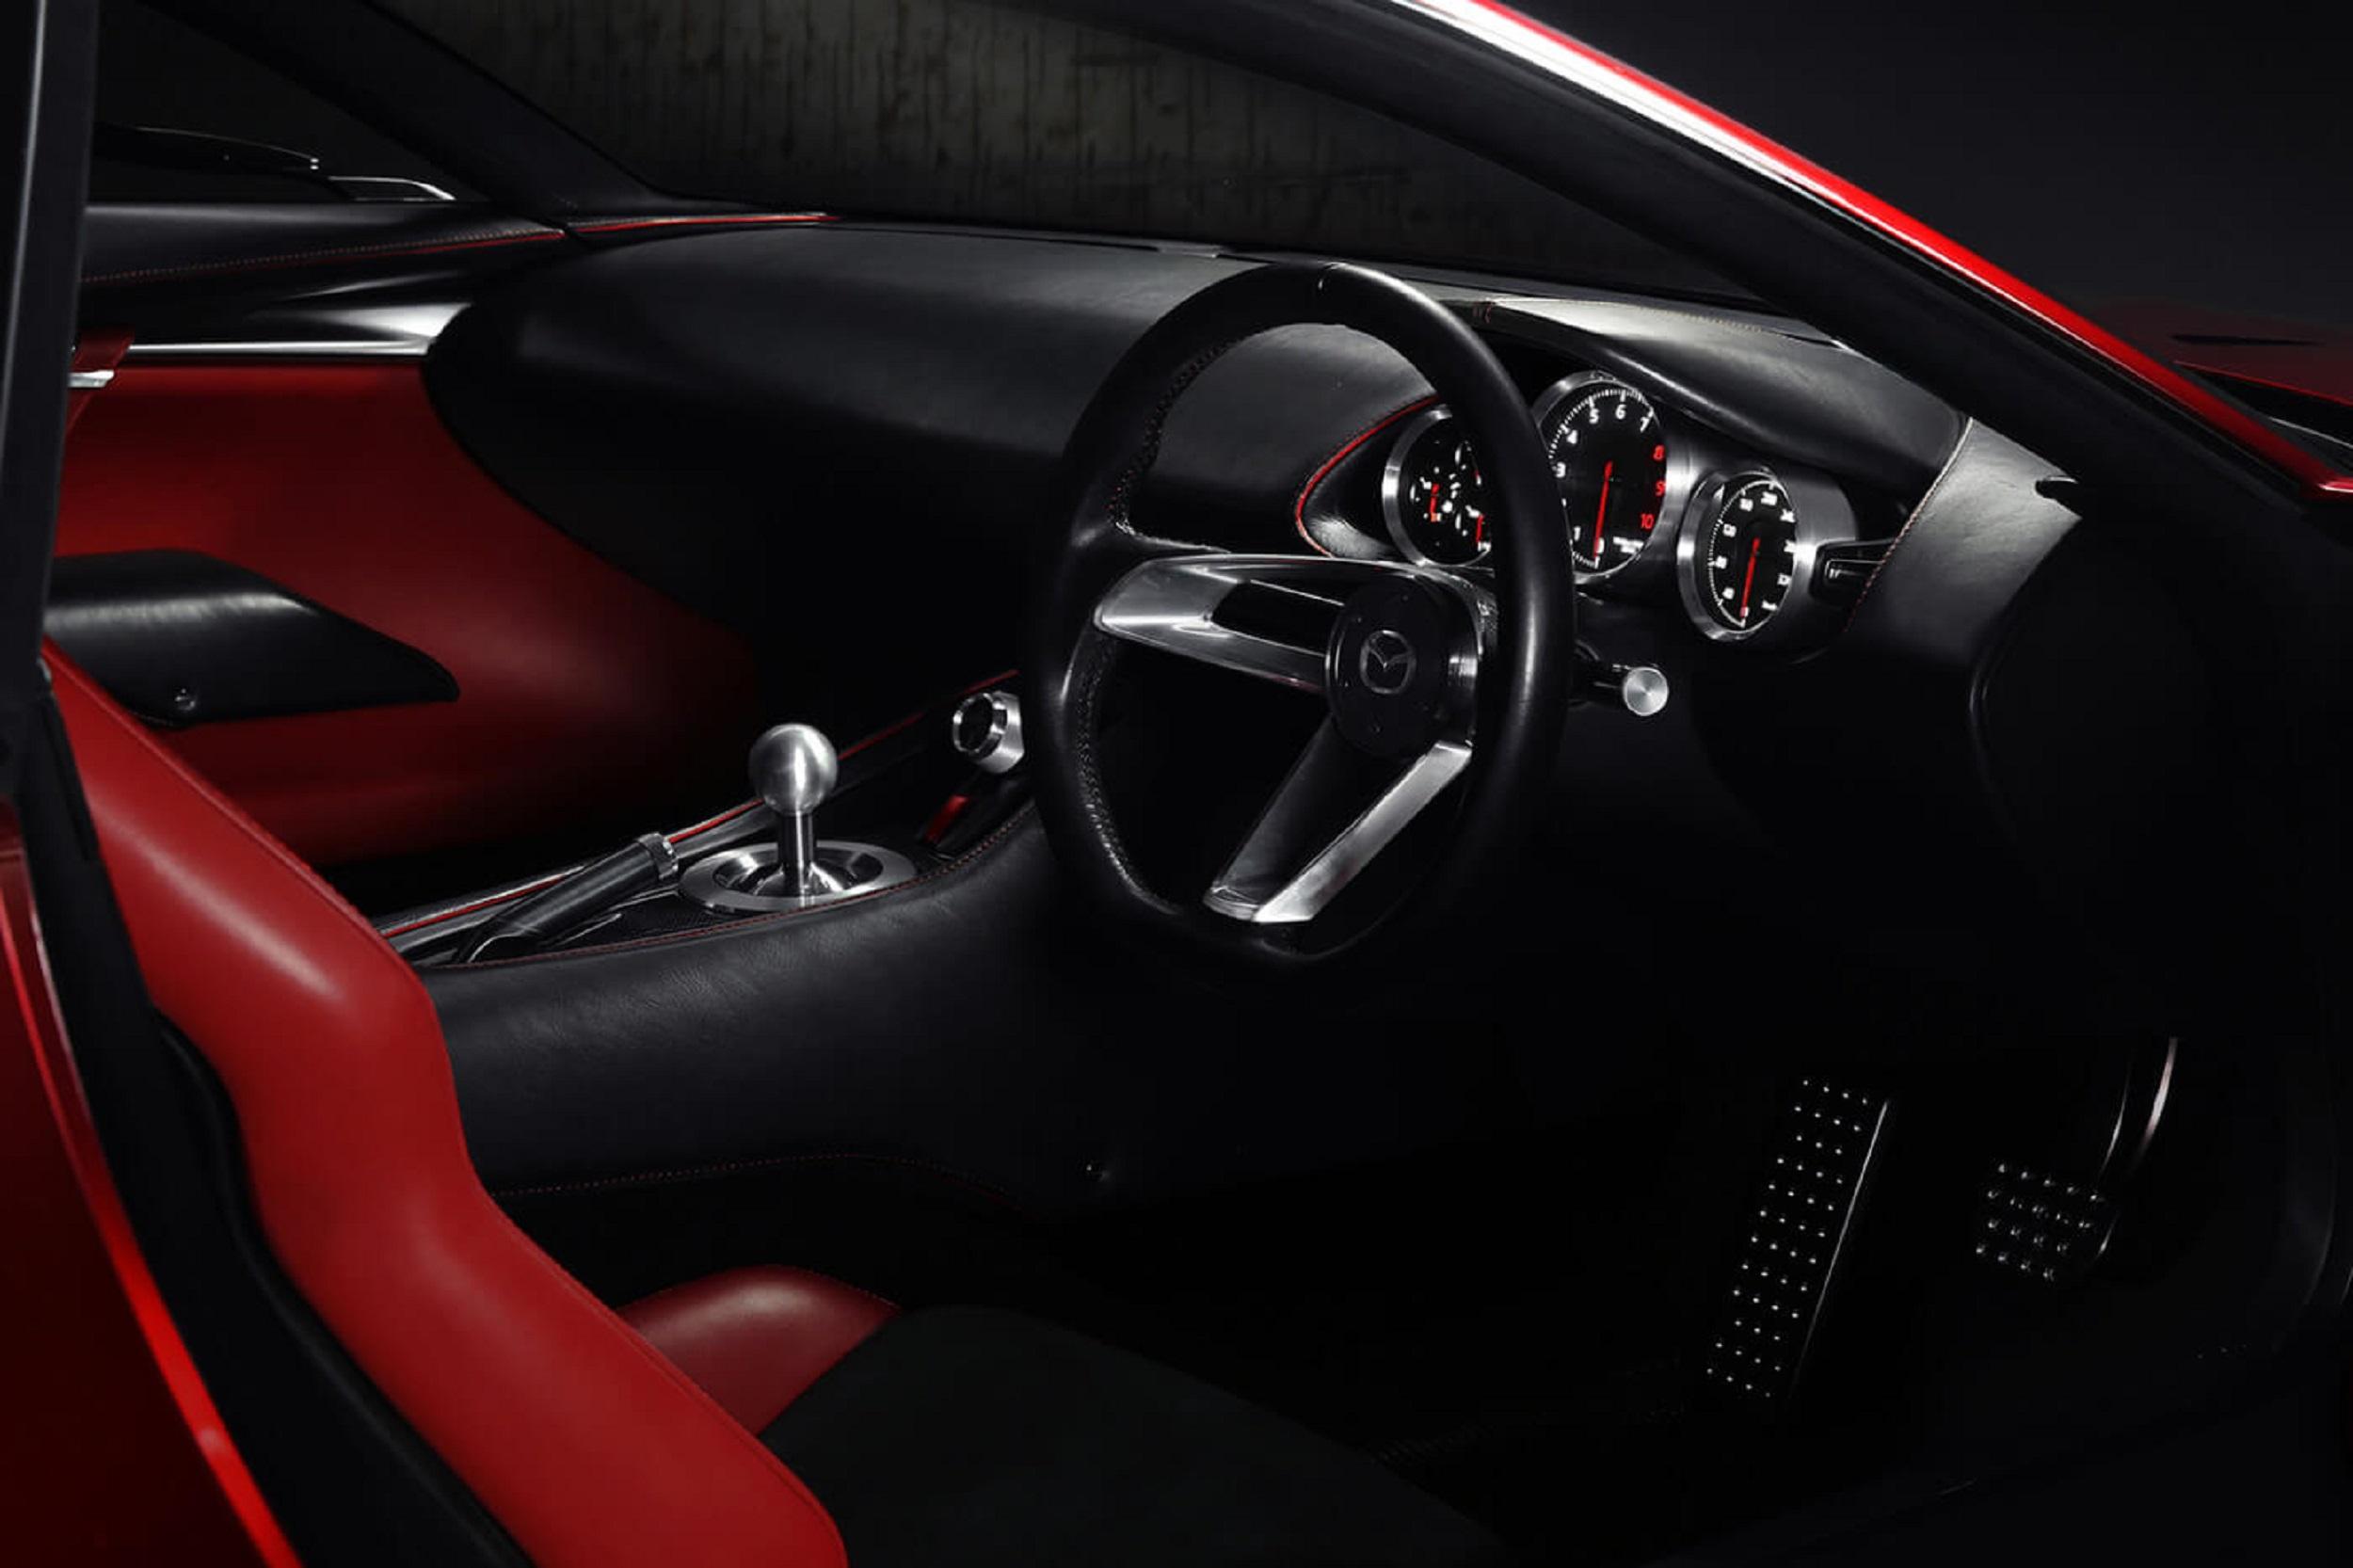 Mazda car interior red and black